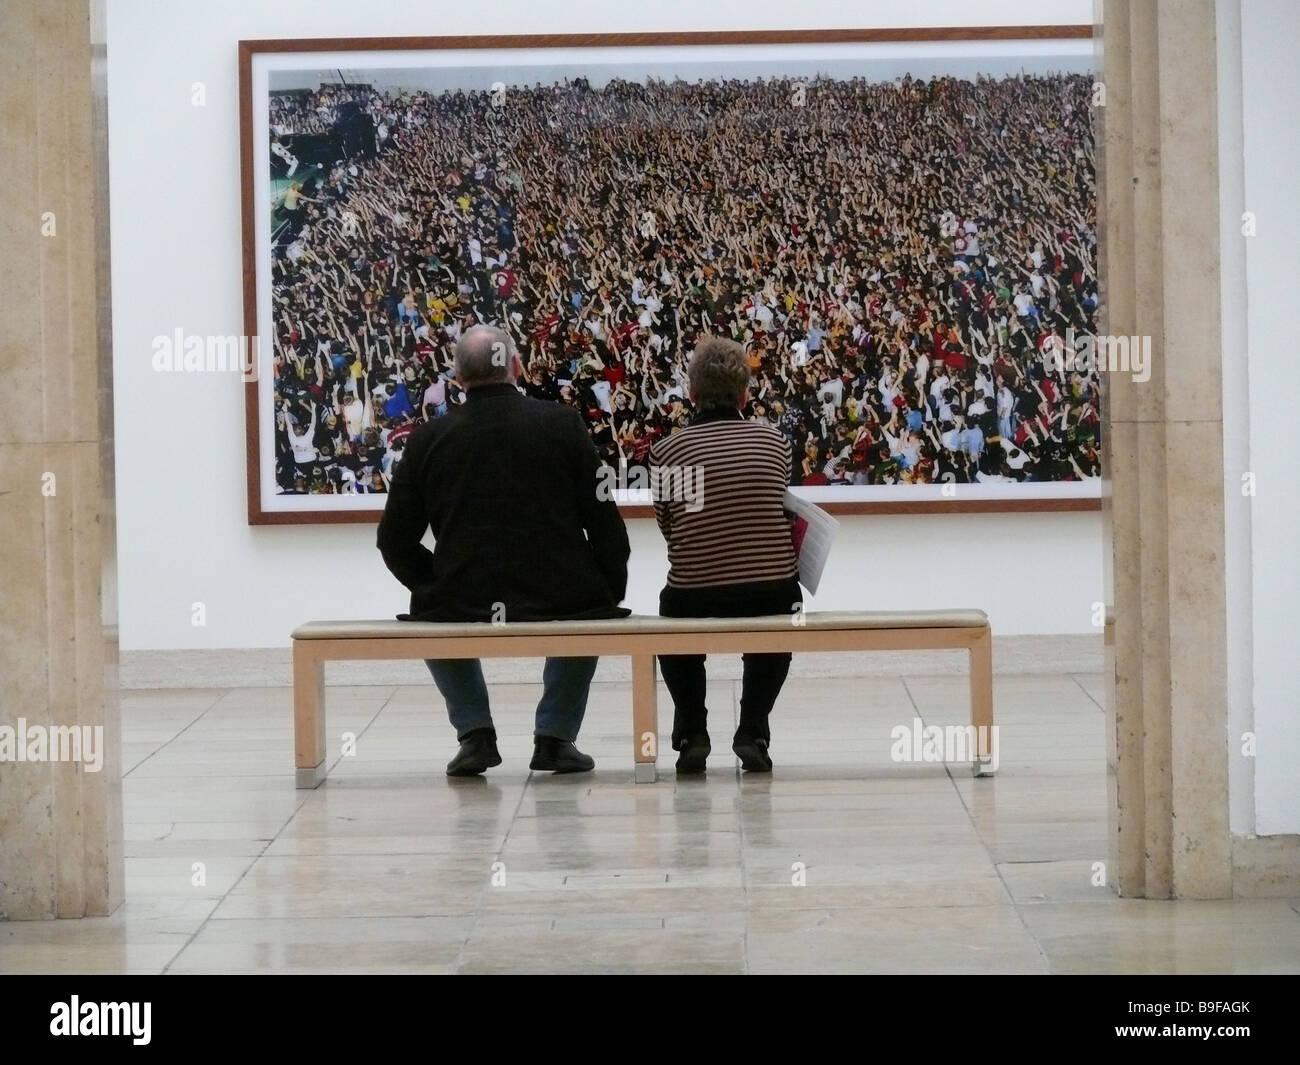 Andreas Gursky Stockfotos & Andreas Gursky Bilder Alamy